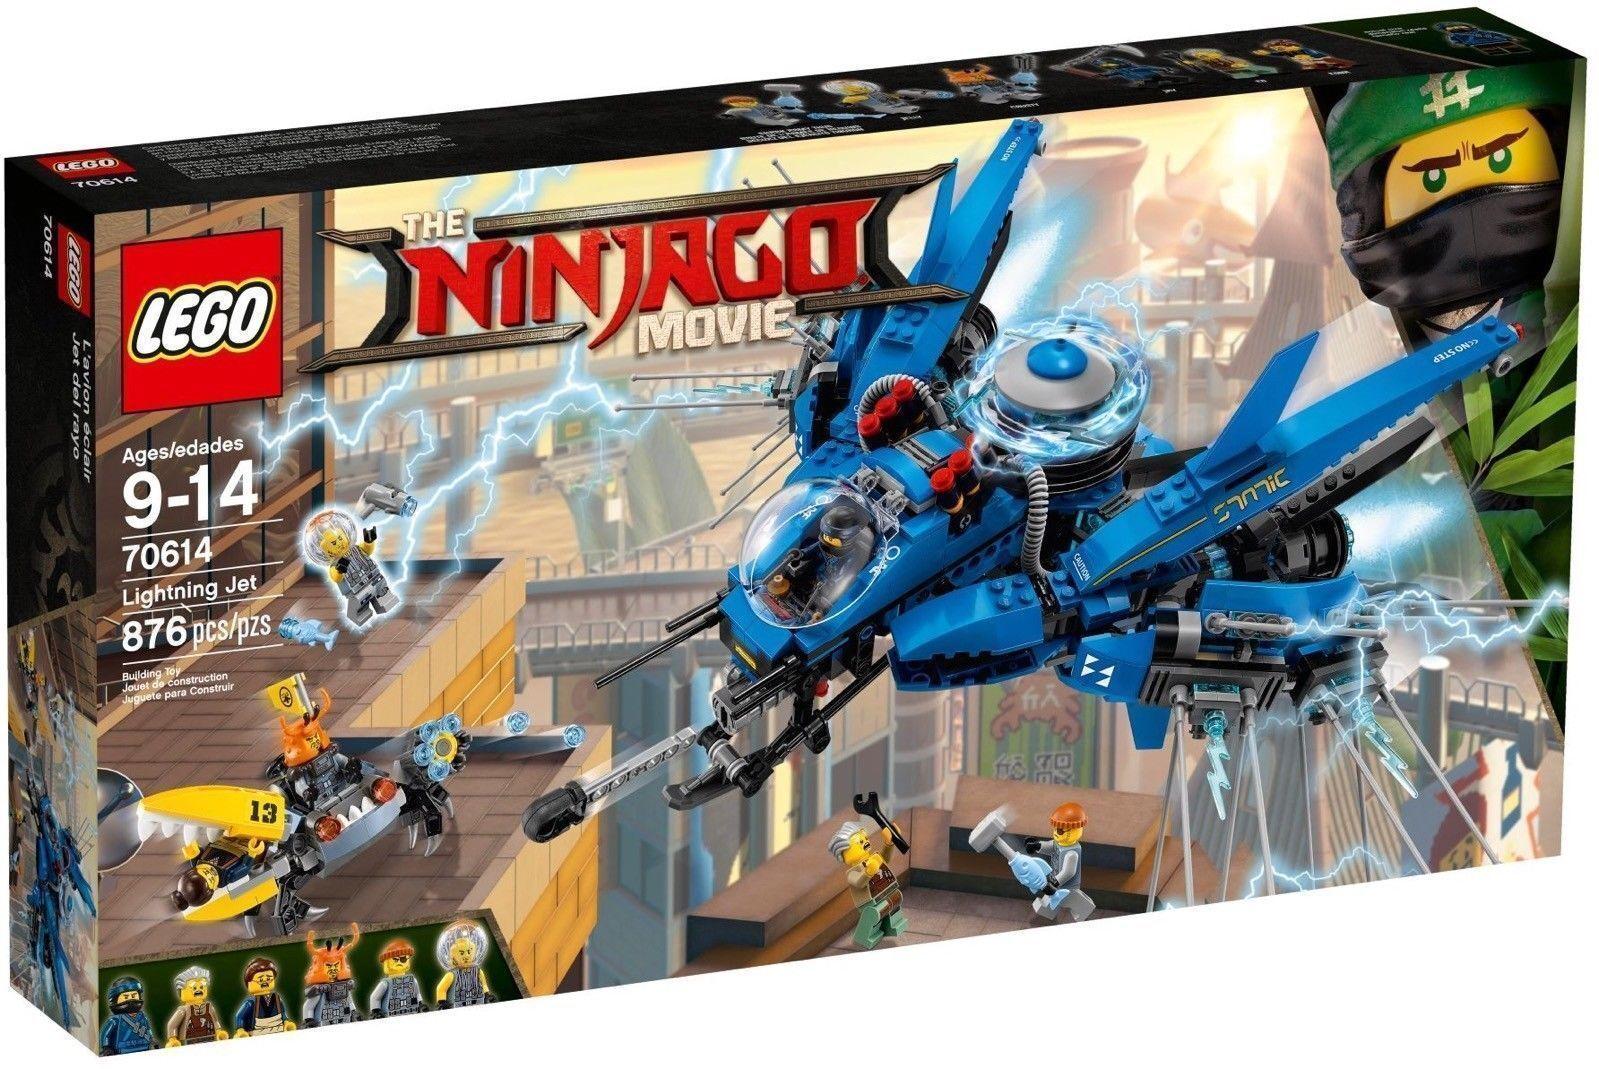 LEGO NINJAGO MOVIE JET FULMINE - LEGO 70614